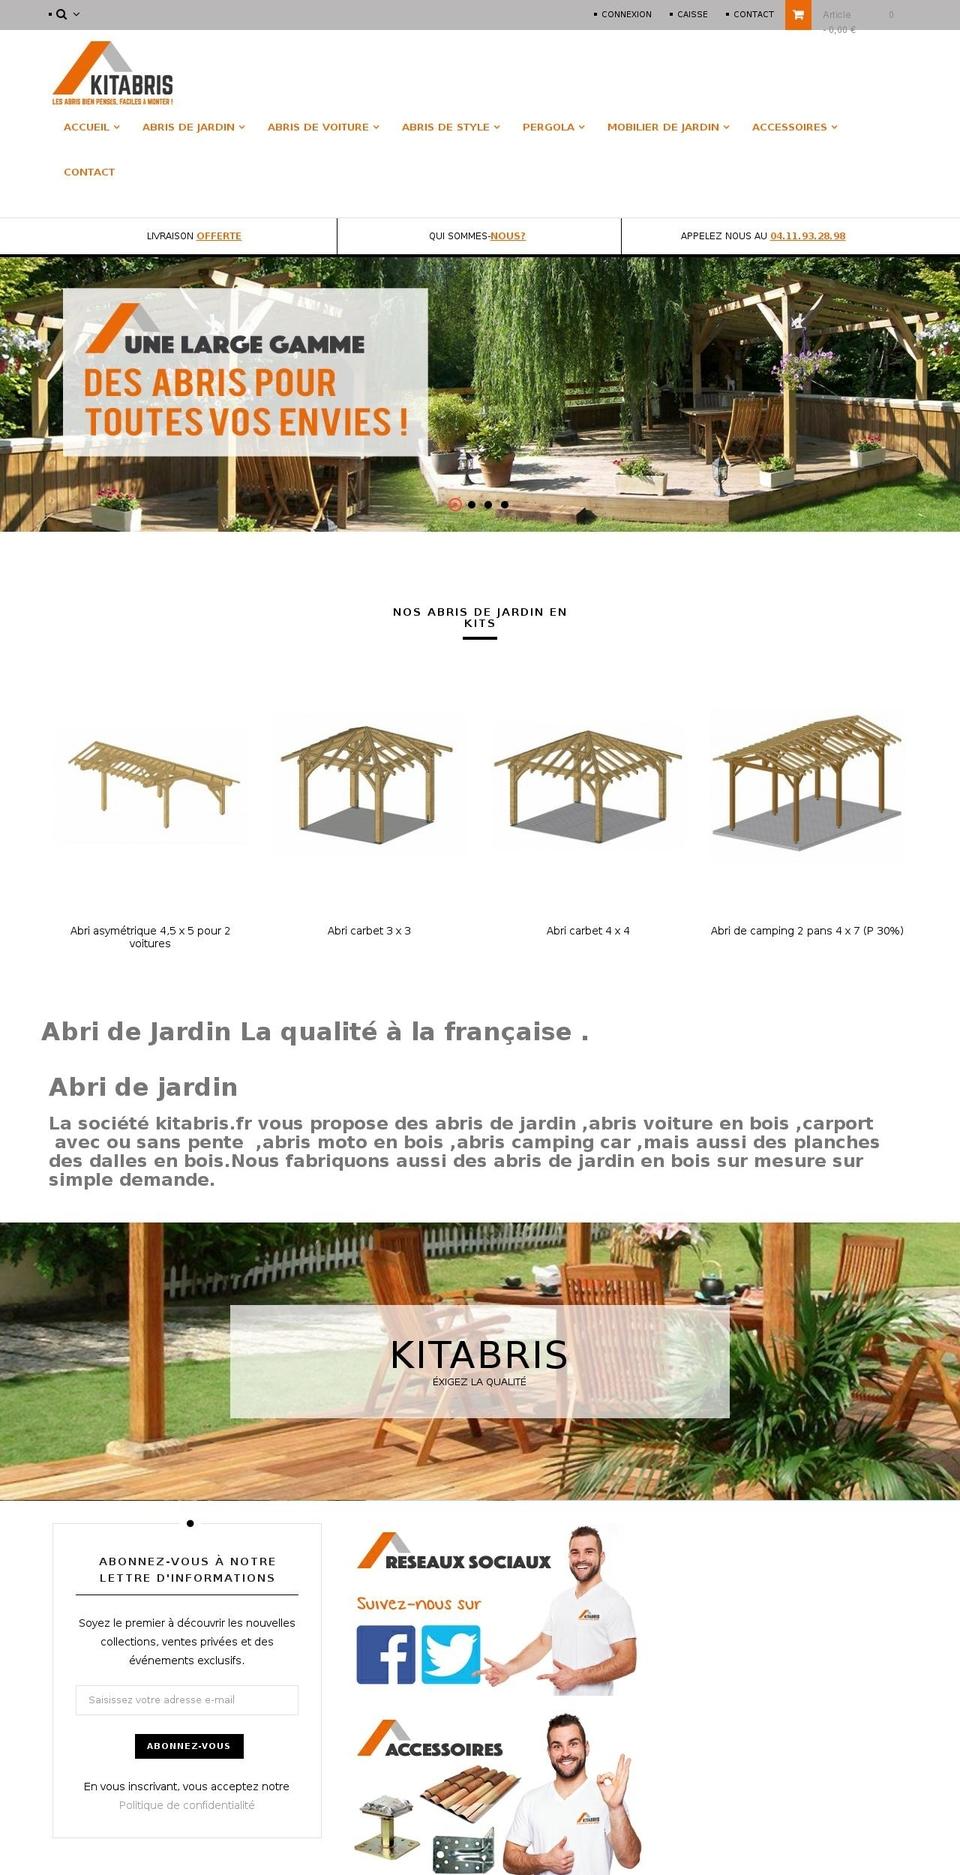 Vel_Amote Prestashop Theme Store Examples, Vel_Amote Theme ... concernant Abri Moto Jardin